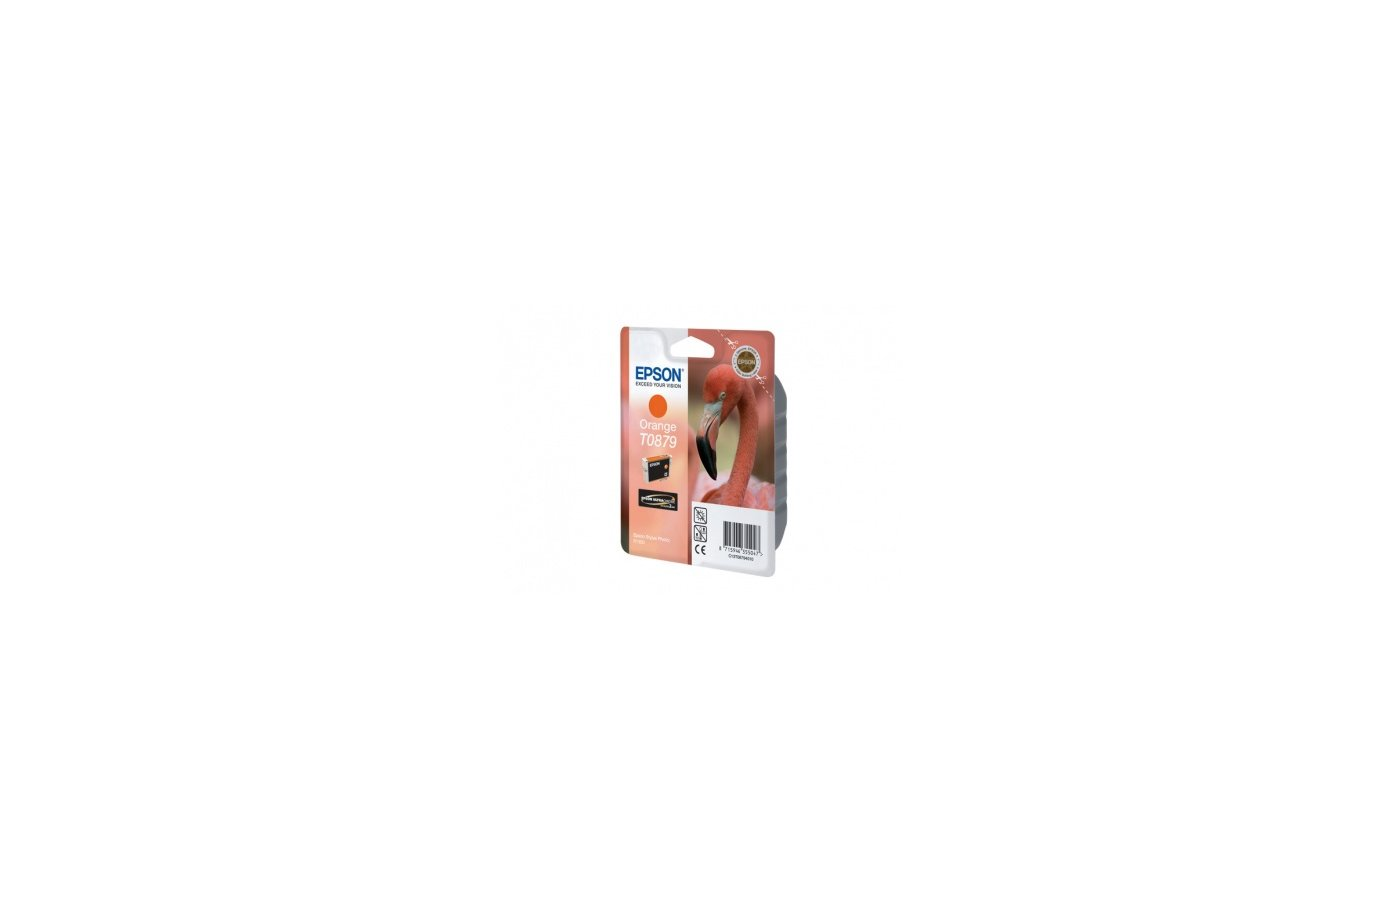 Картридж струйный Epson C13T087940 оранжевый для Stylus Photo R1900